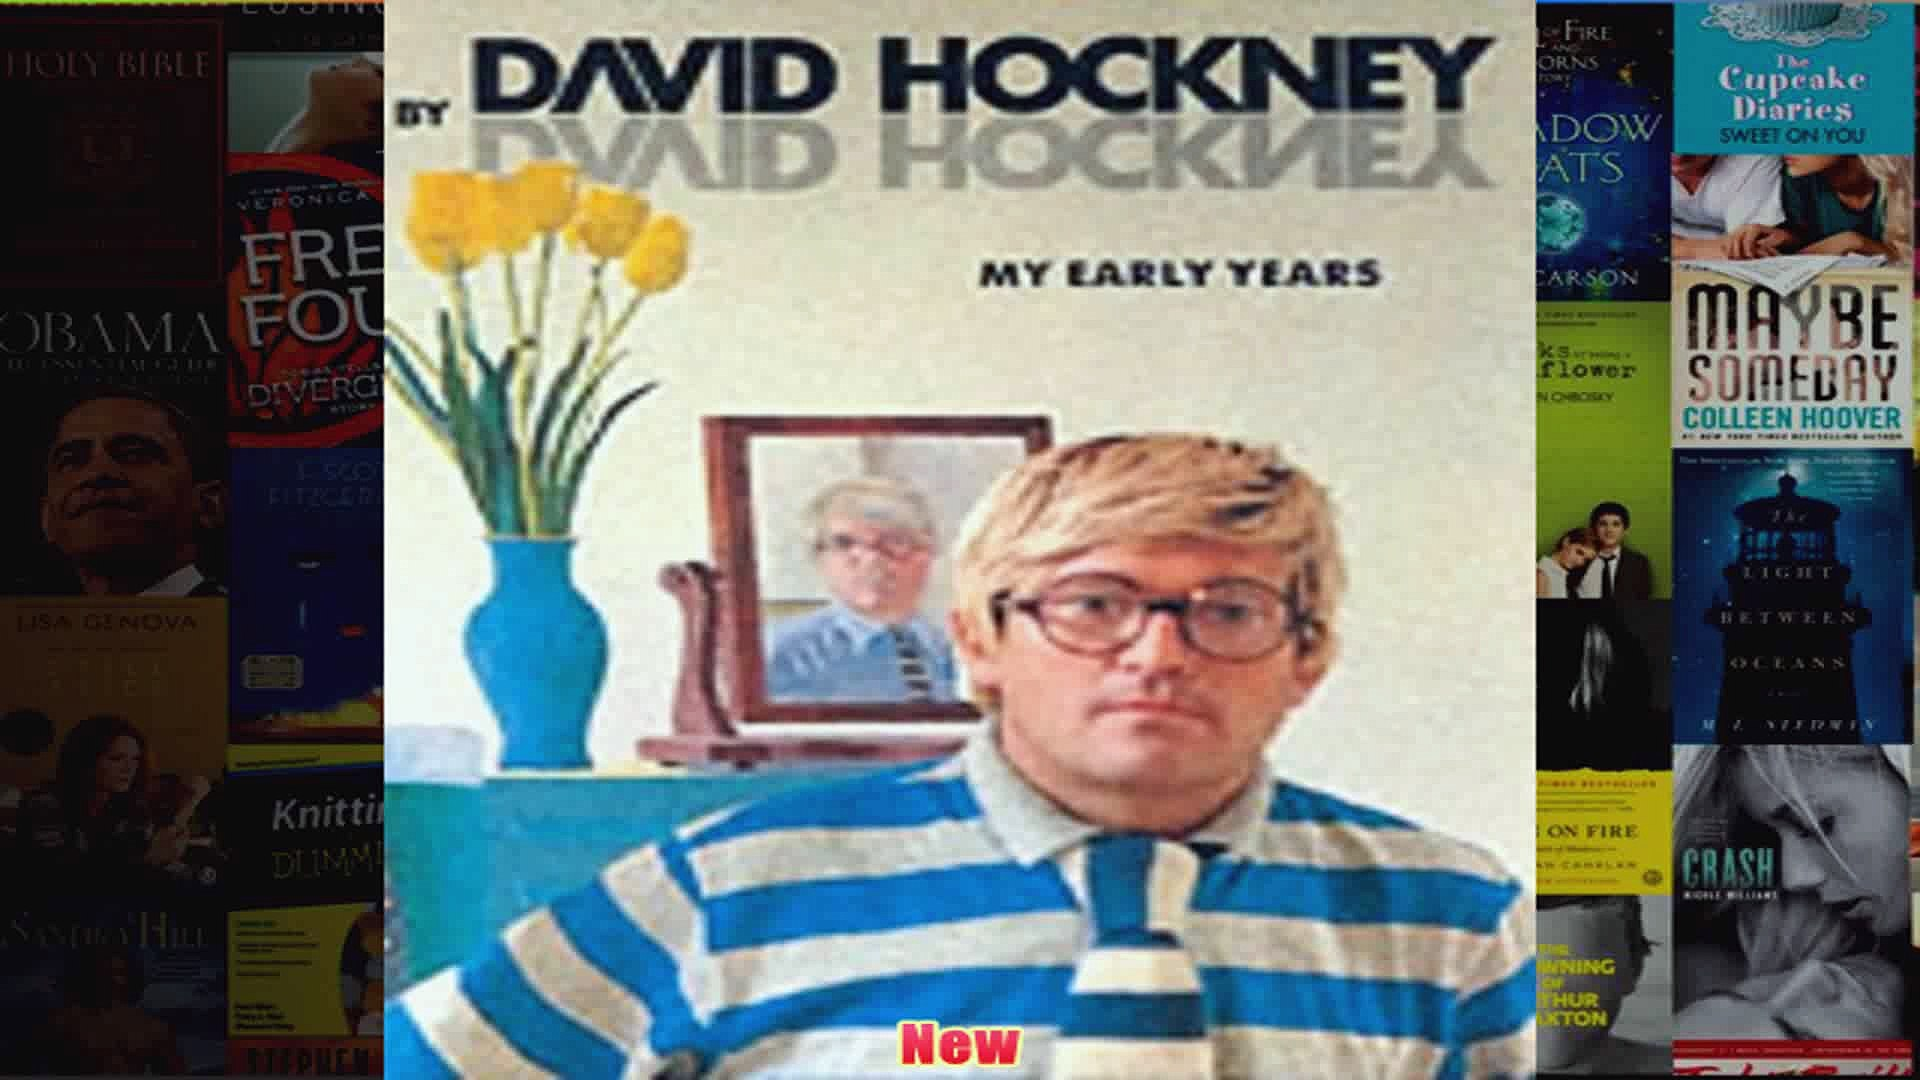 My Early Years David Hockney by David Hockney